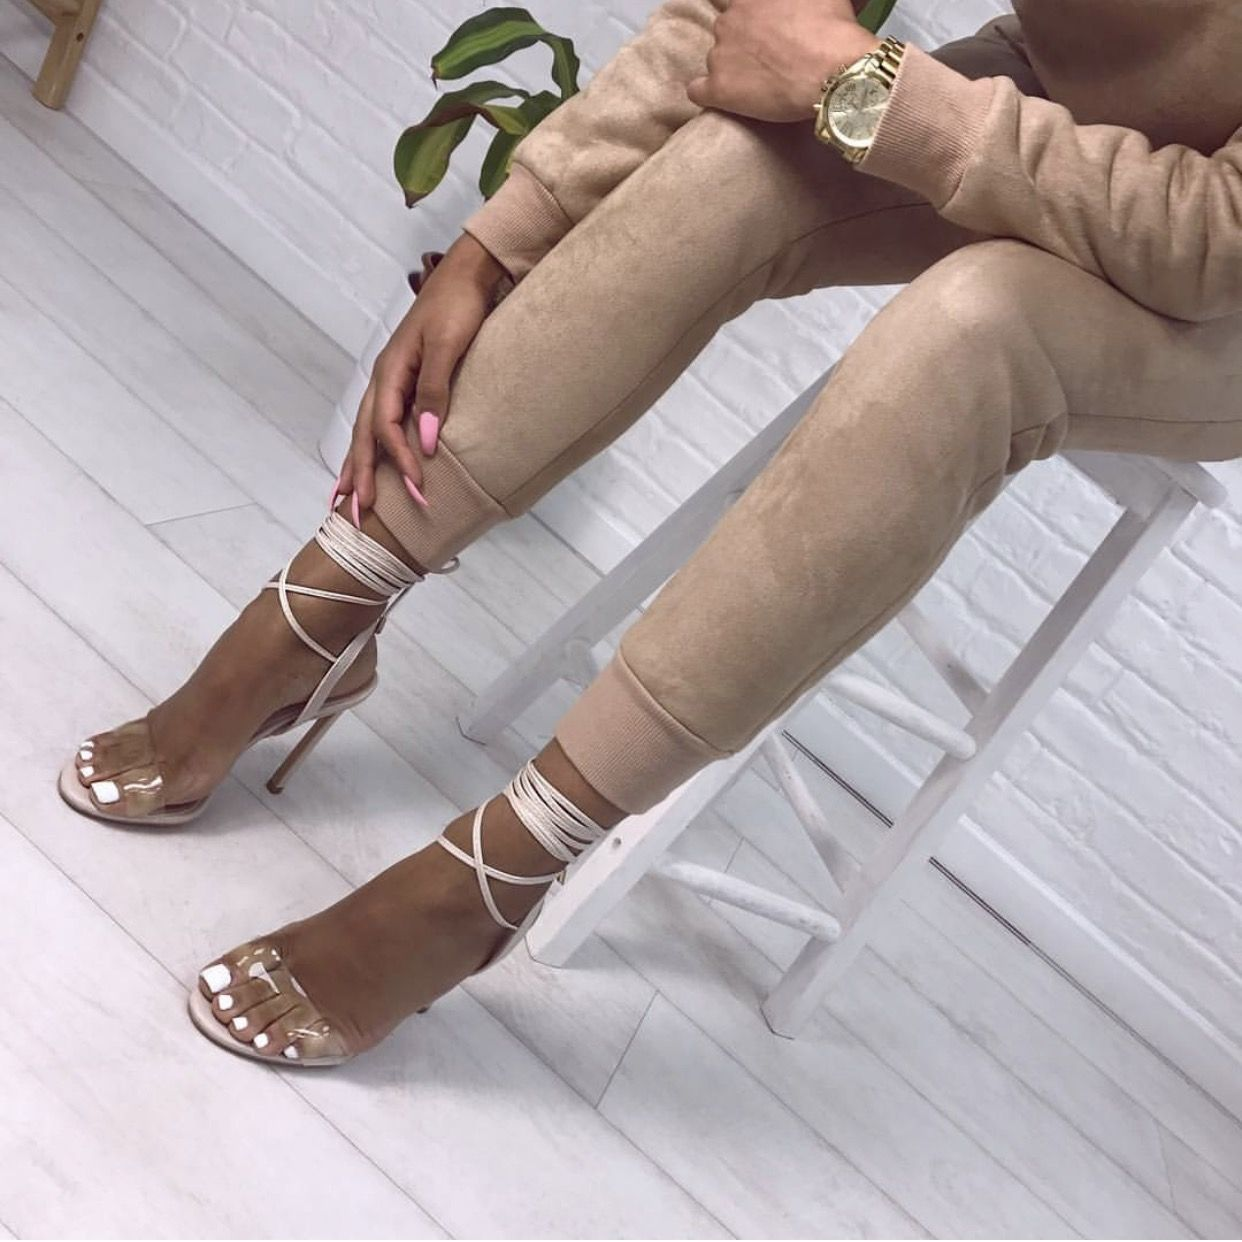 b6a234455ee 2017 Simmi Shoe Trends. Wrap around clear heel in nude.  LJONESSTYLE ...